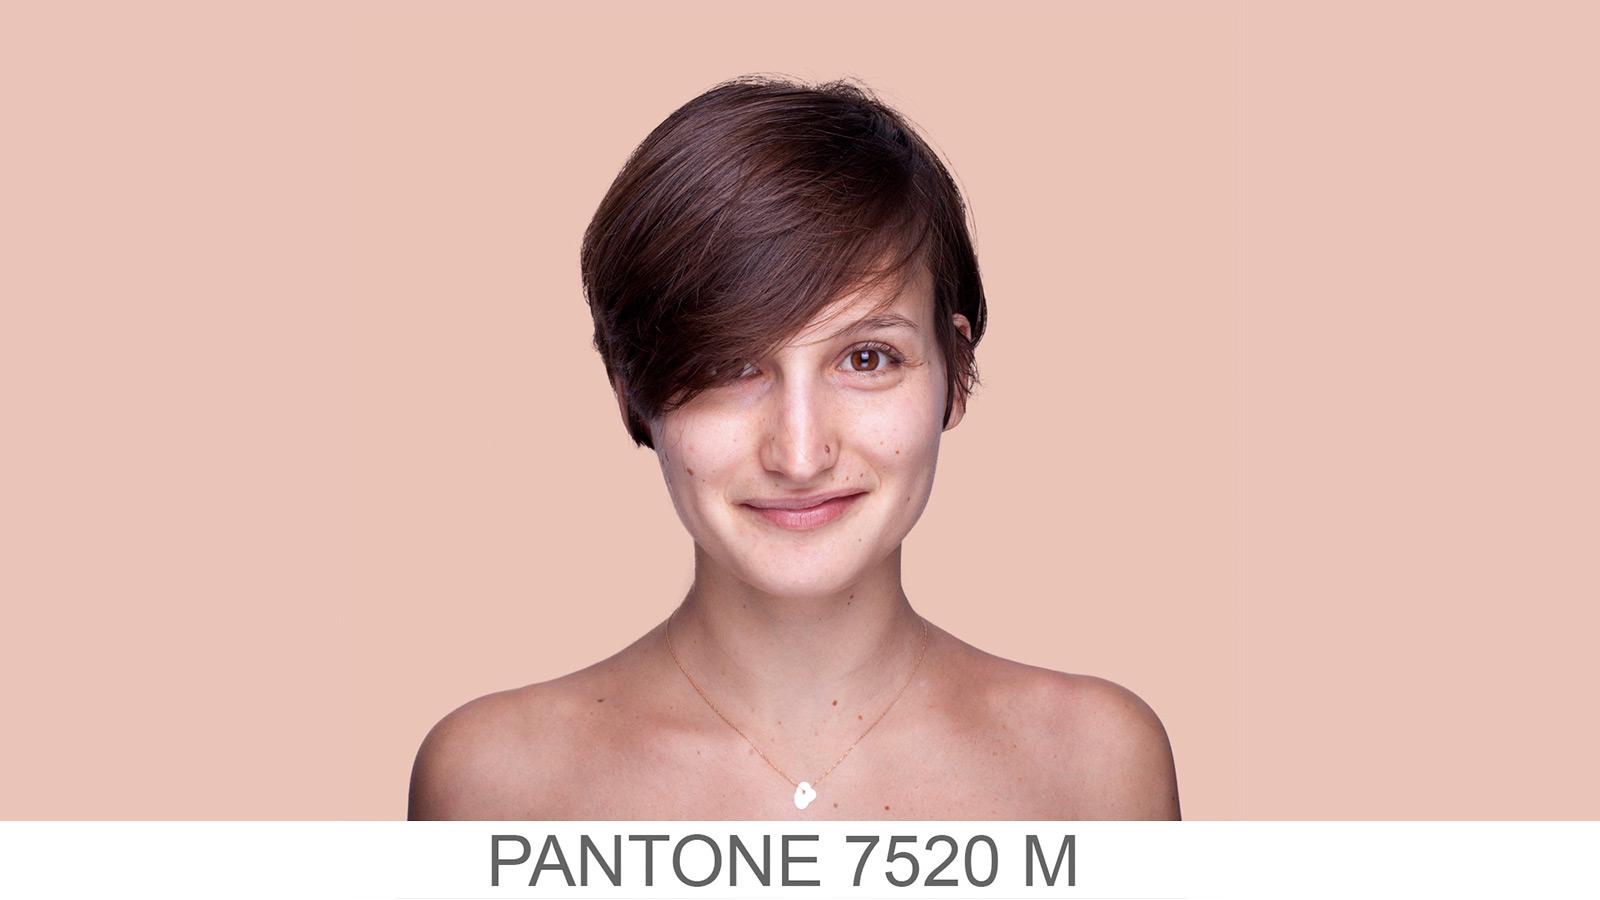 angelica-dass-humanae-pantone-series-3-woman